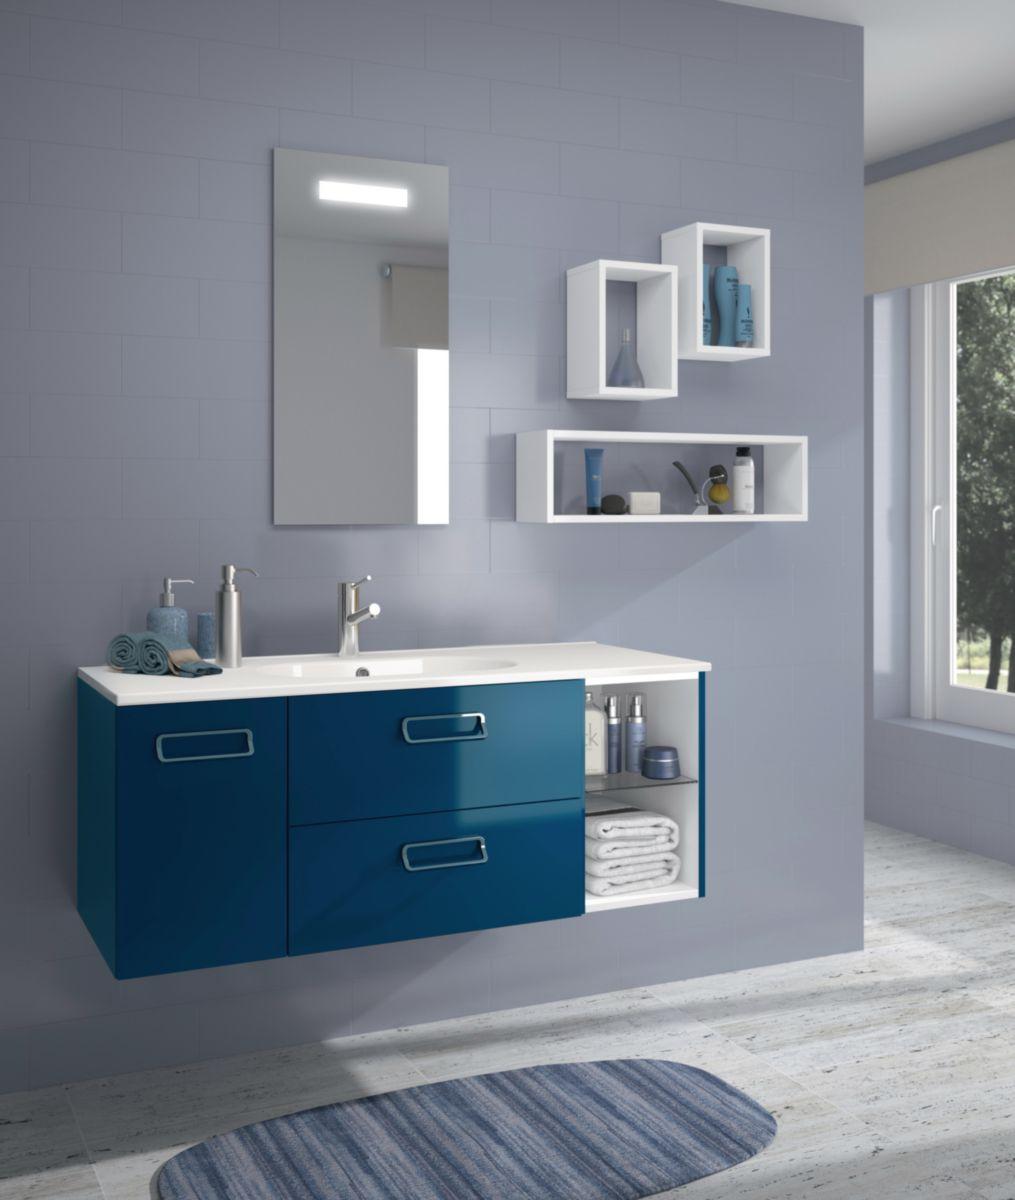 Meuble sous-vasque SEDUCTA 60 cm 2 tiroirs bleu